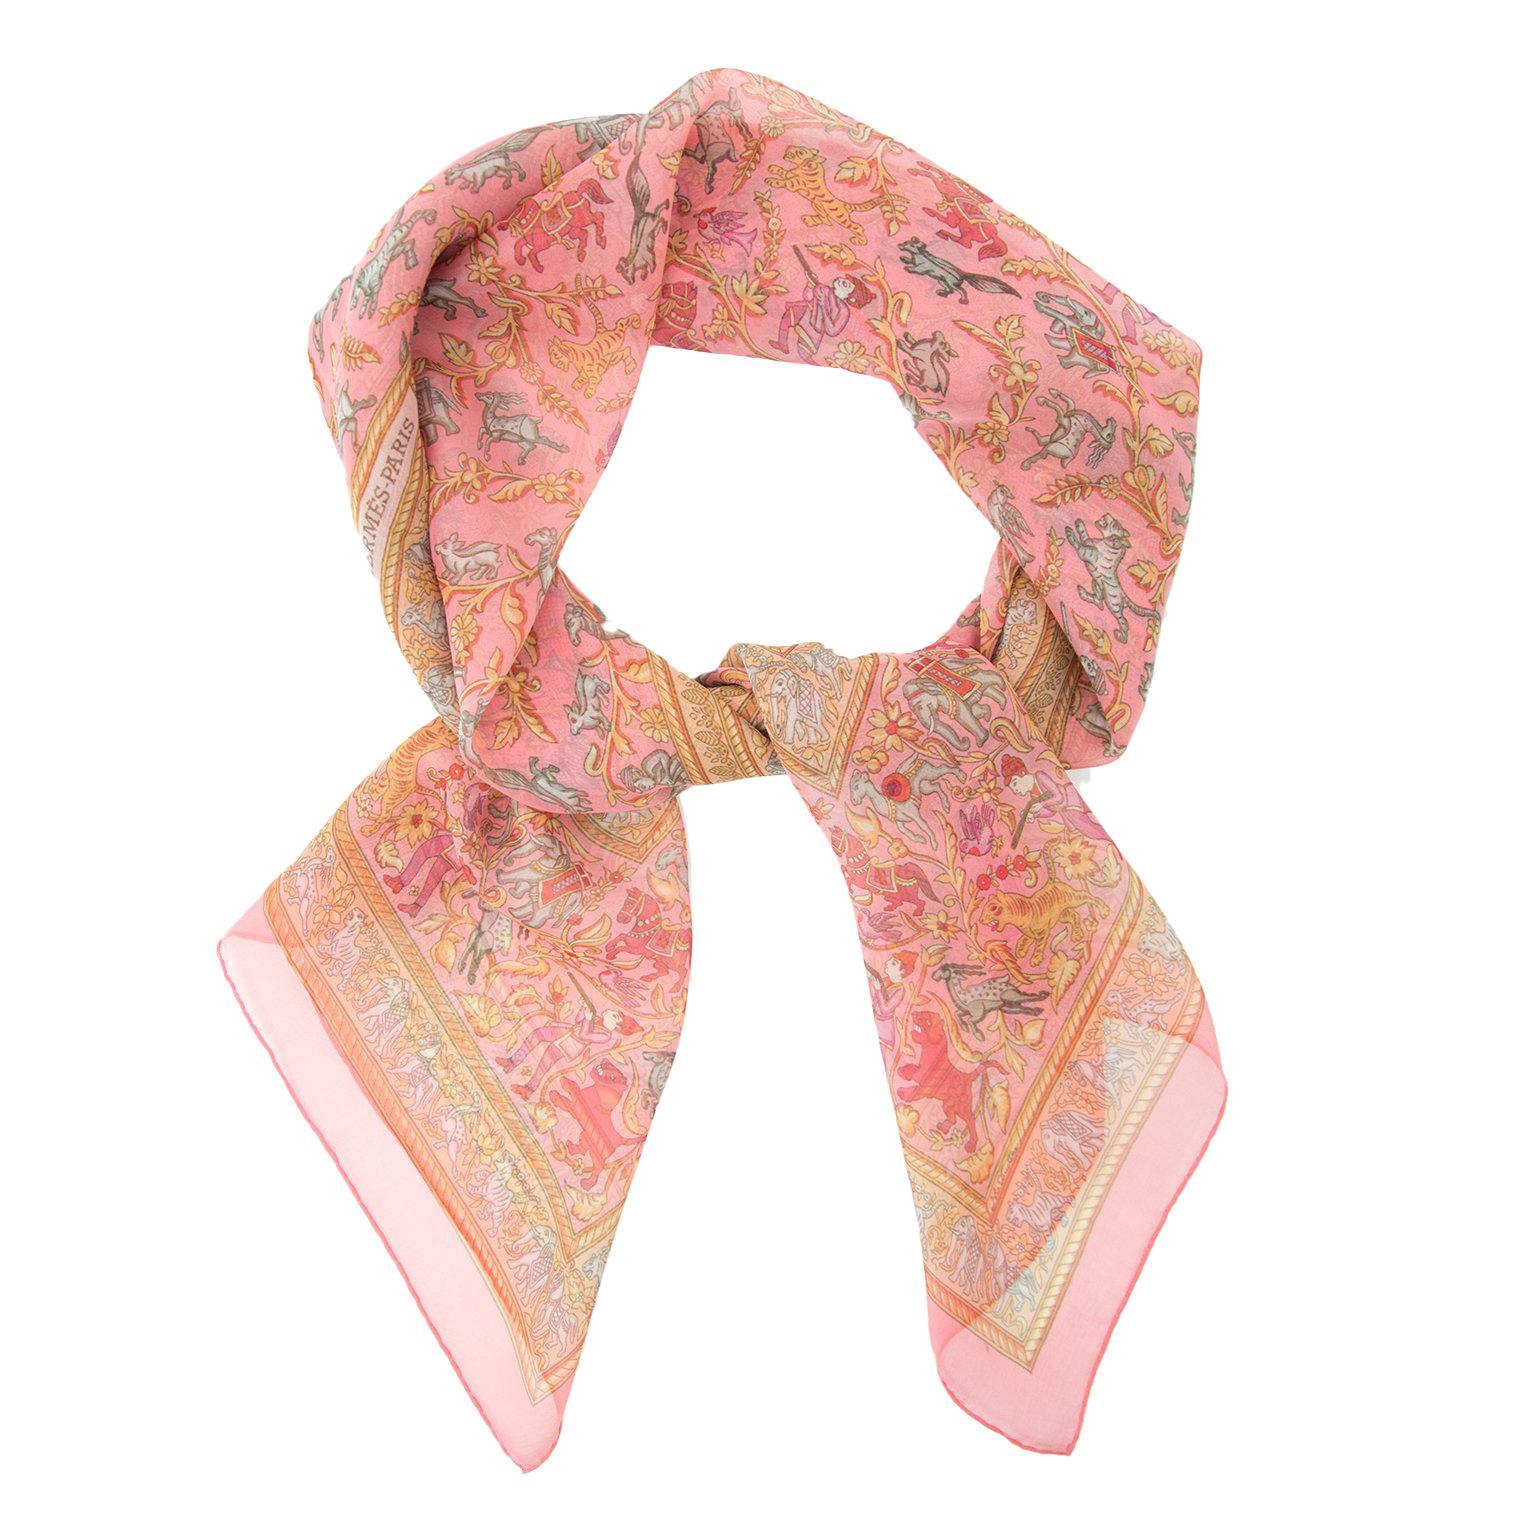 Hermès Mousseline Silk Scarf Chasse en Inde